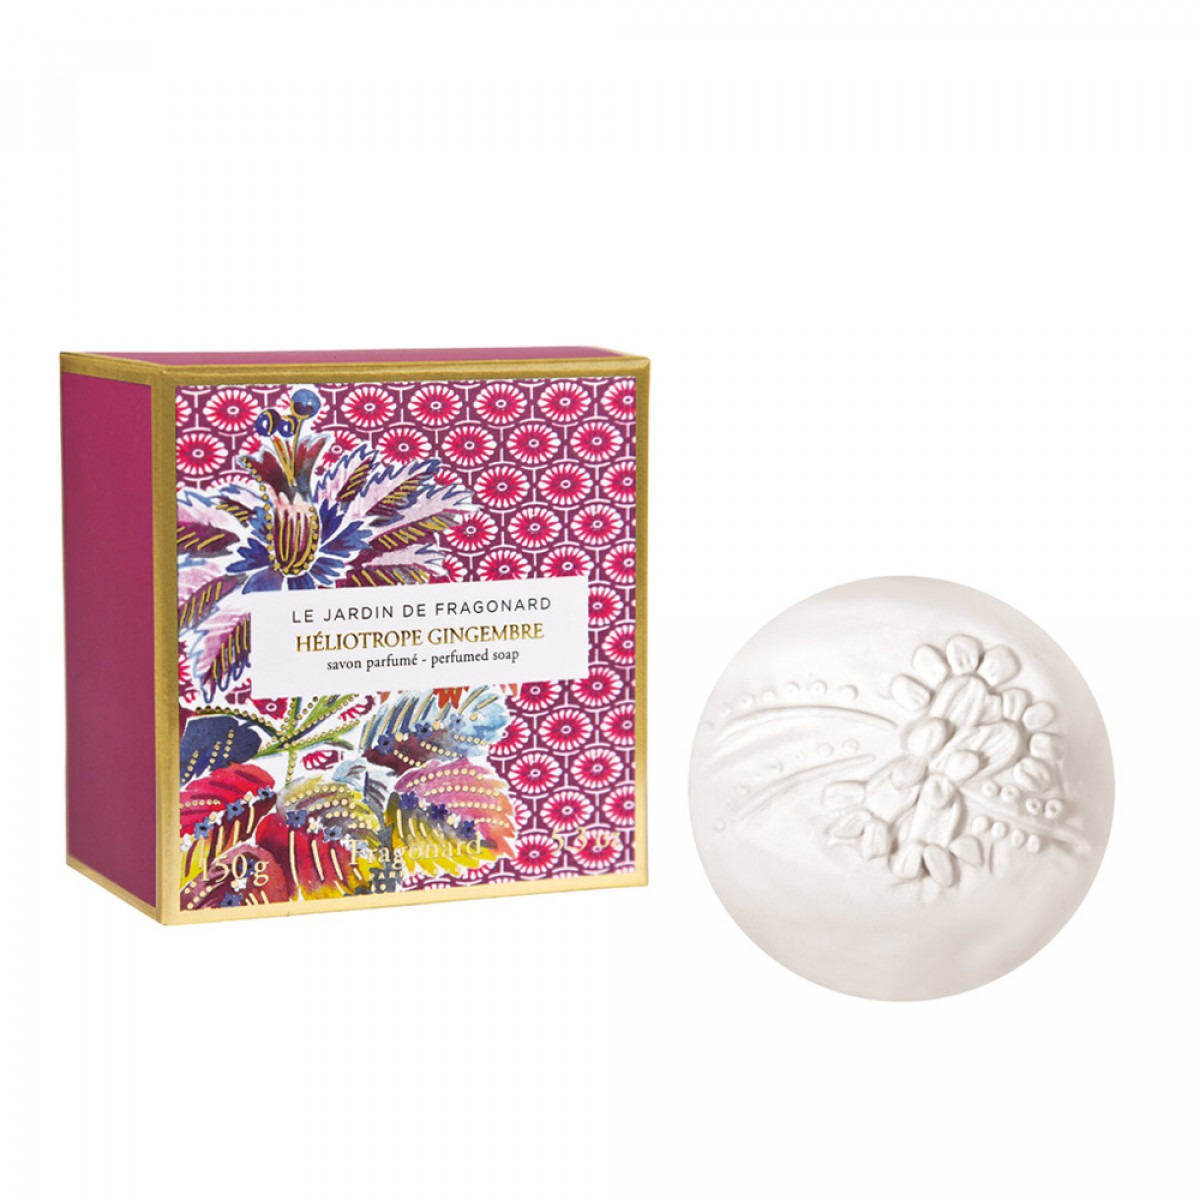 Le Jardin De Fragonard Heliotrope - Gingembre 150g soap